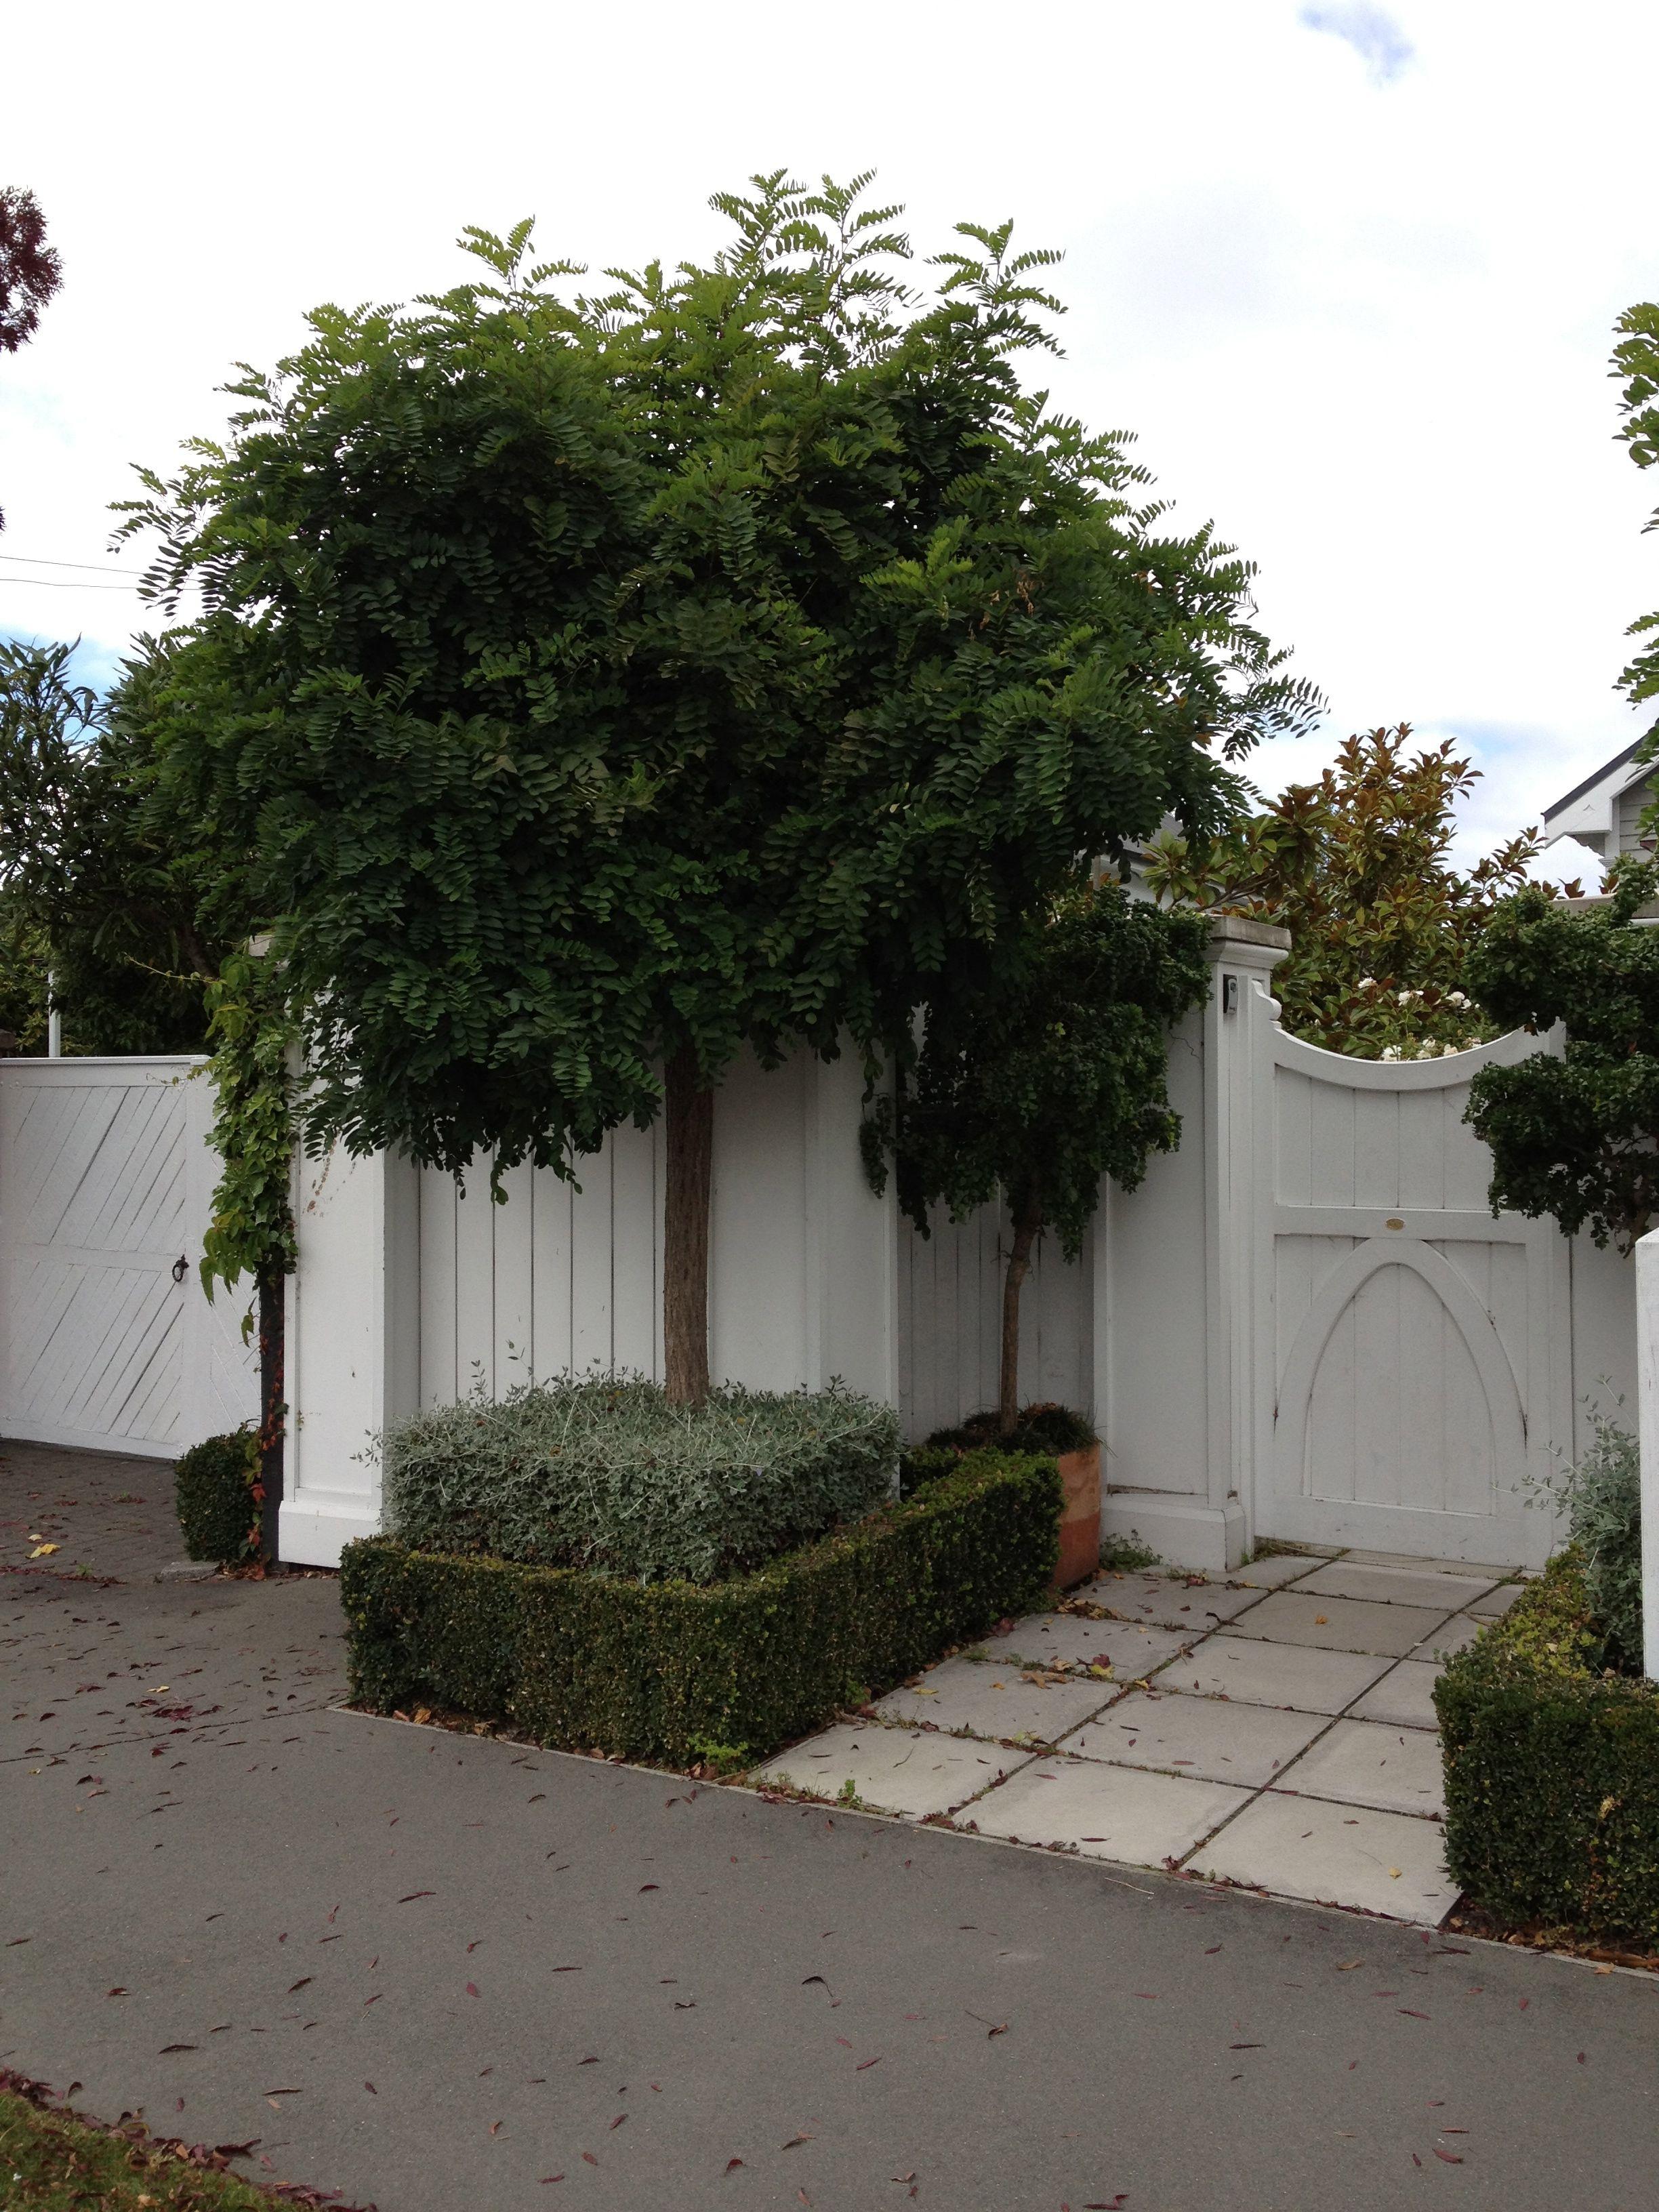 Garden trees for screening  Formal Garden tiered hedge  Gardens  Pinterest